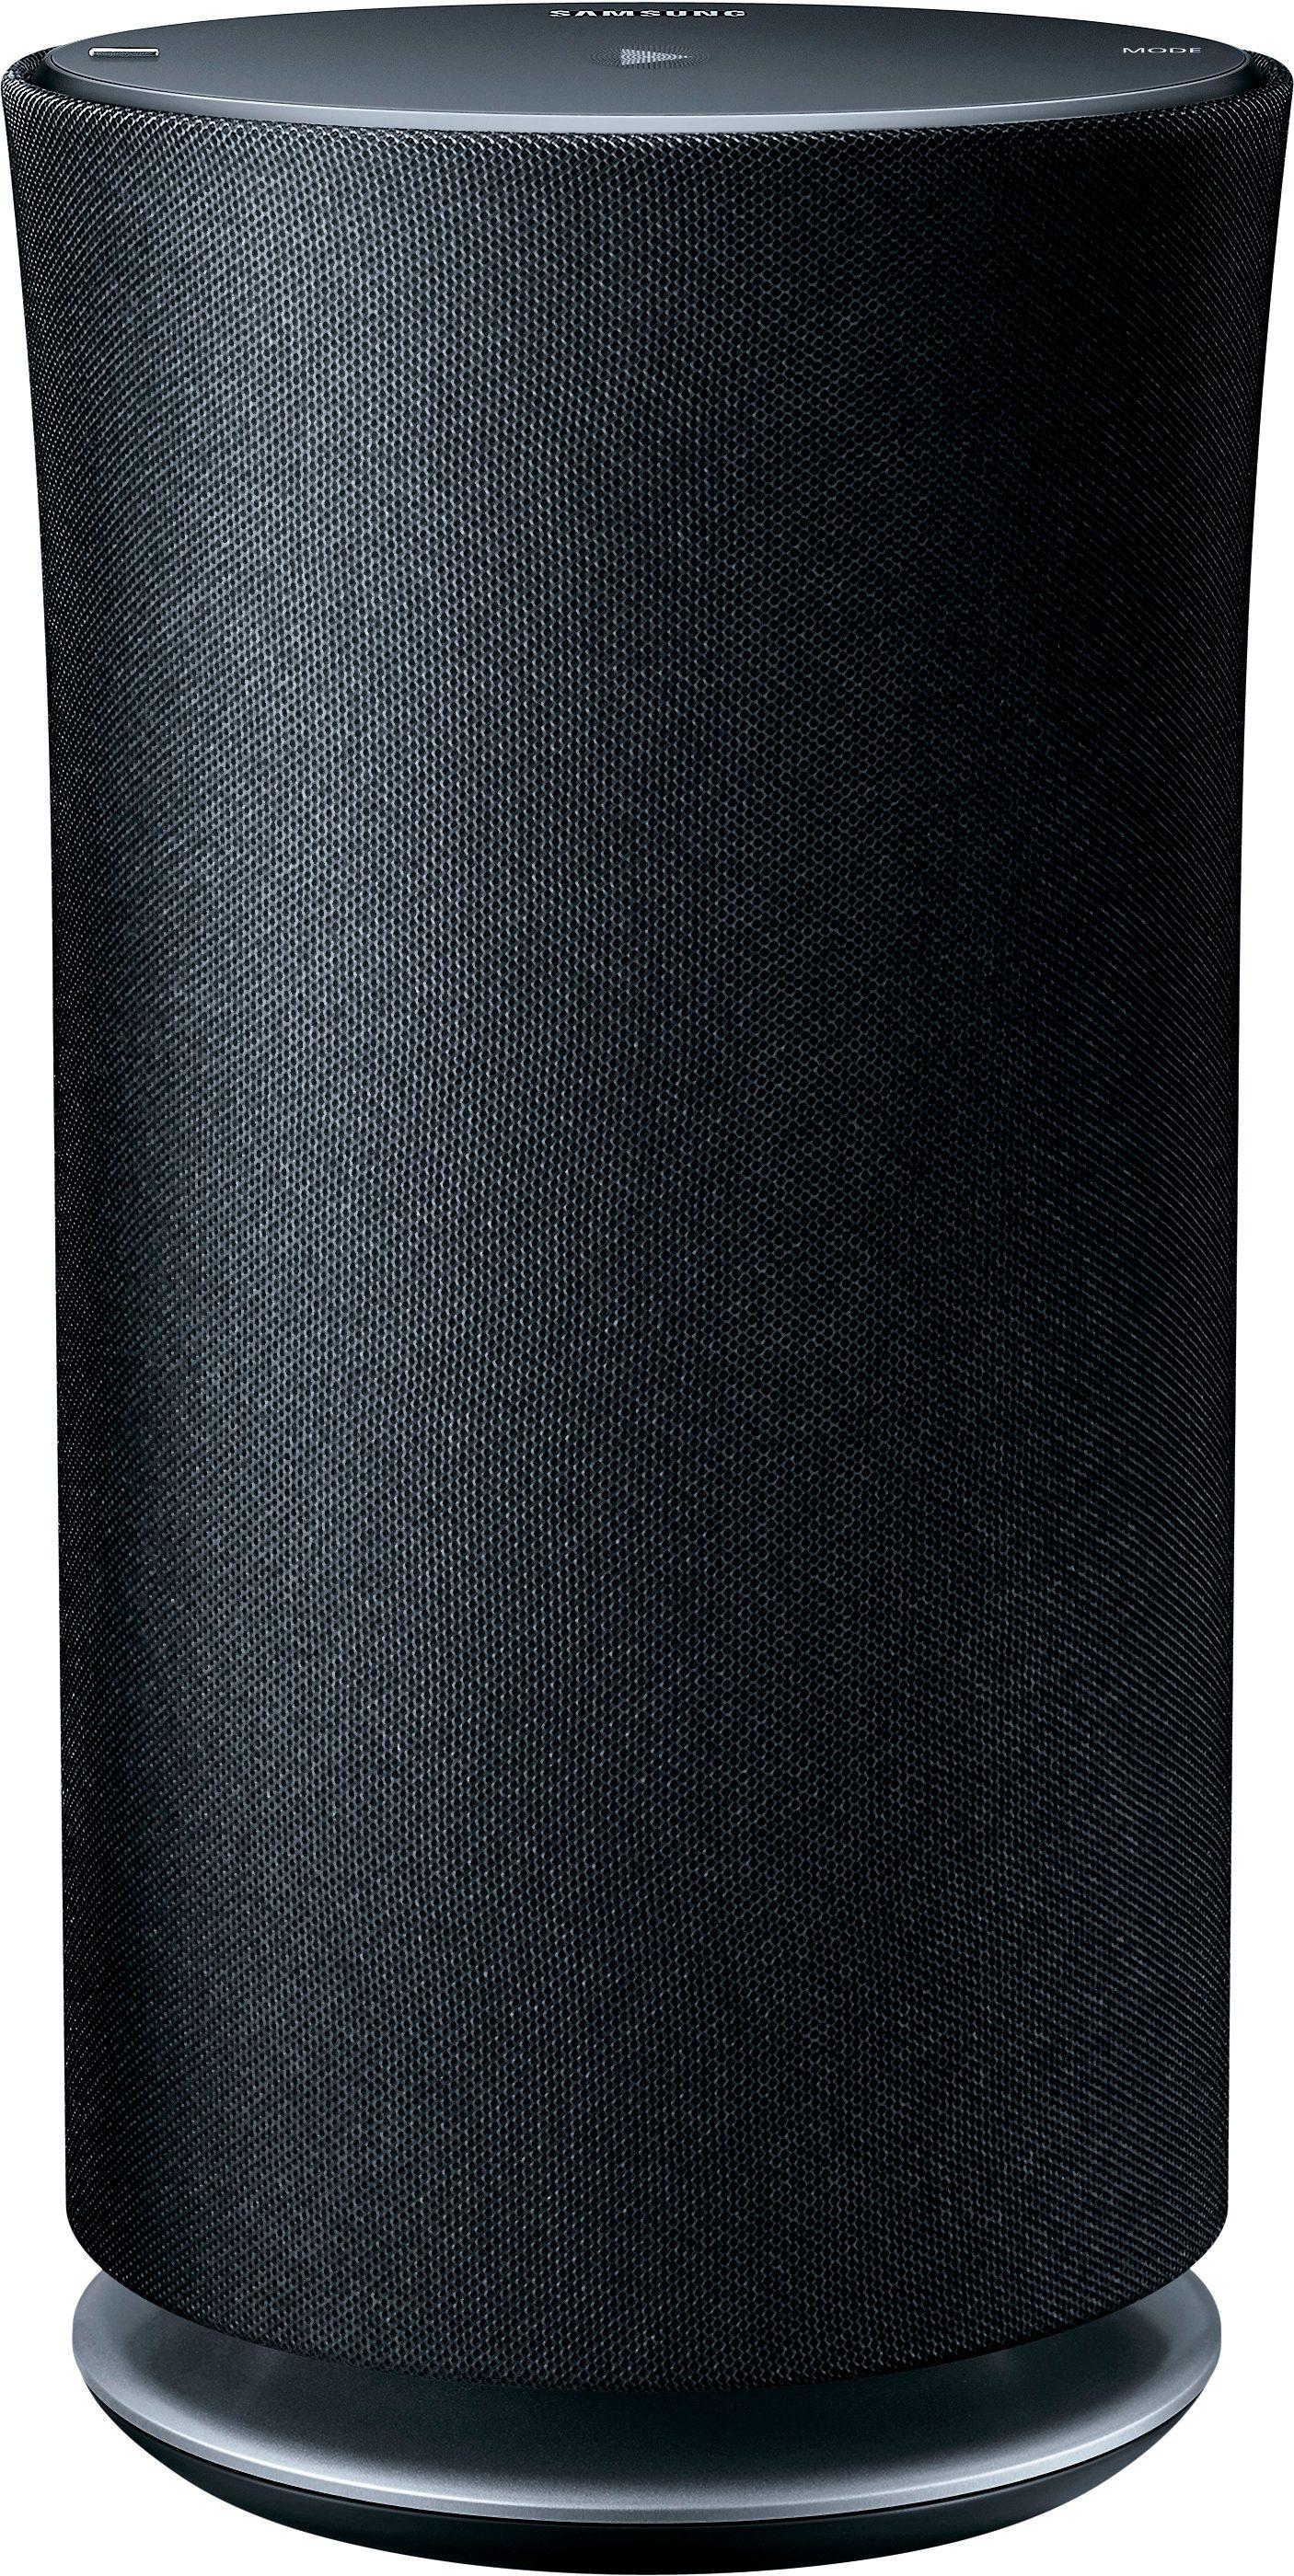 Samsung R5 WAM5500 Lautsprecher (Multiroom, Bluetooth, WiFi)